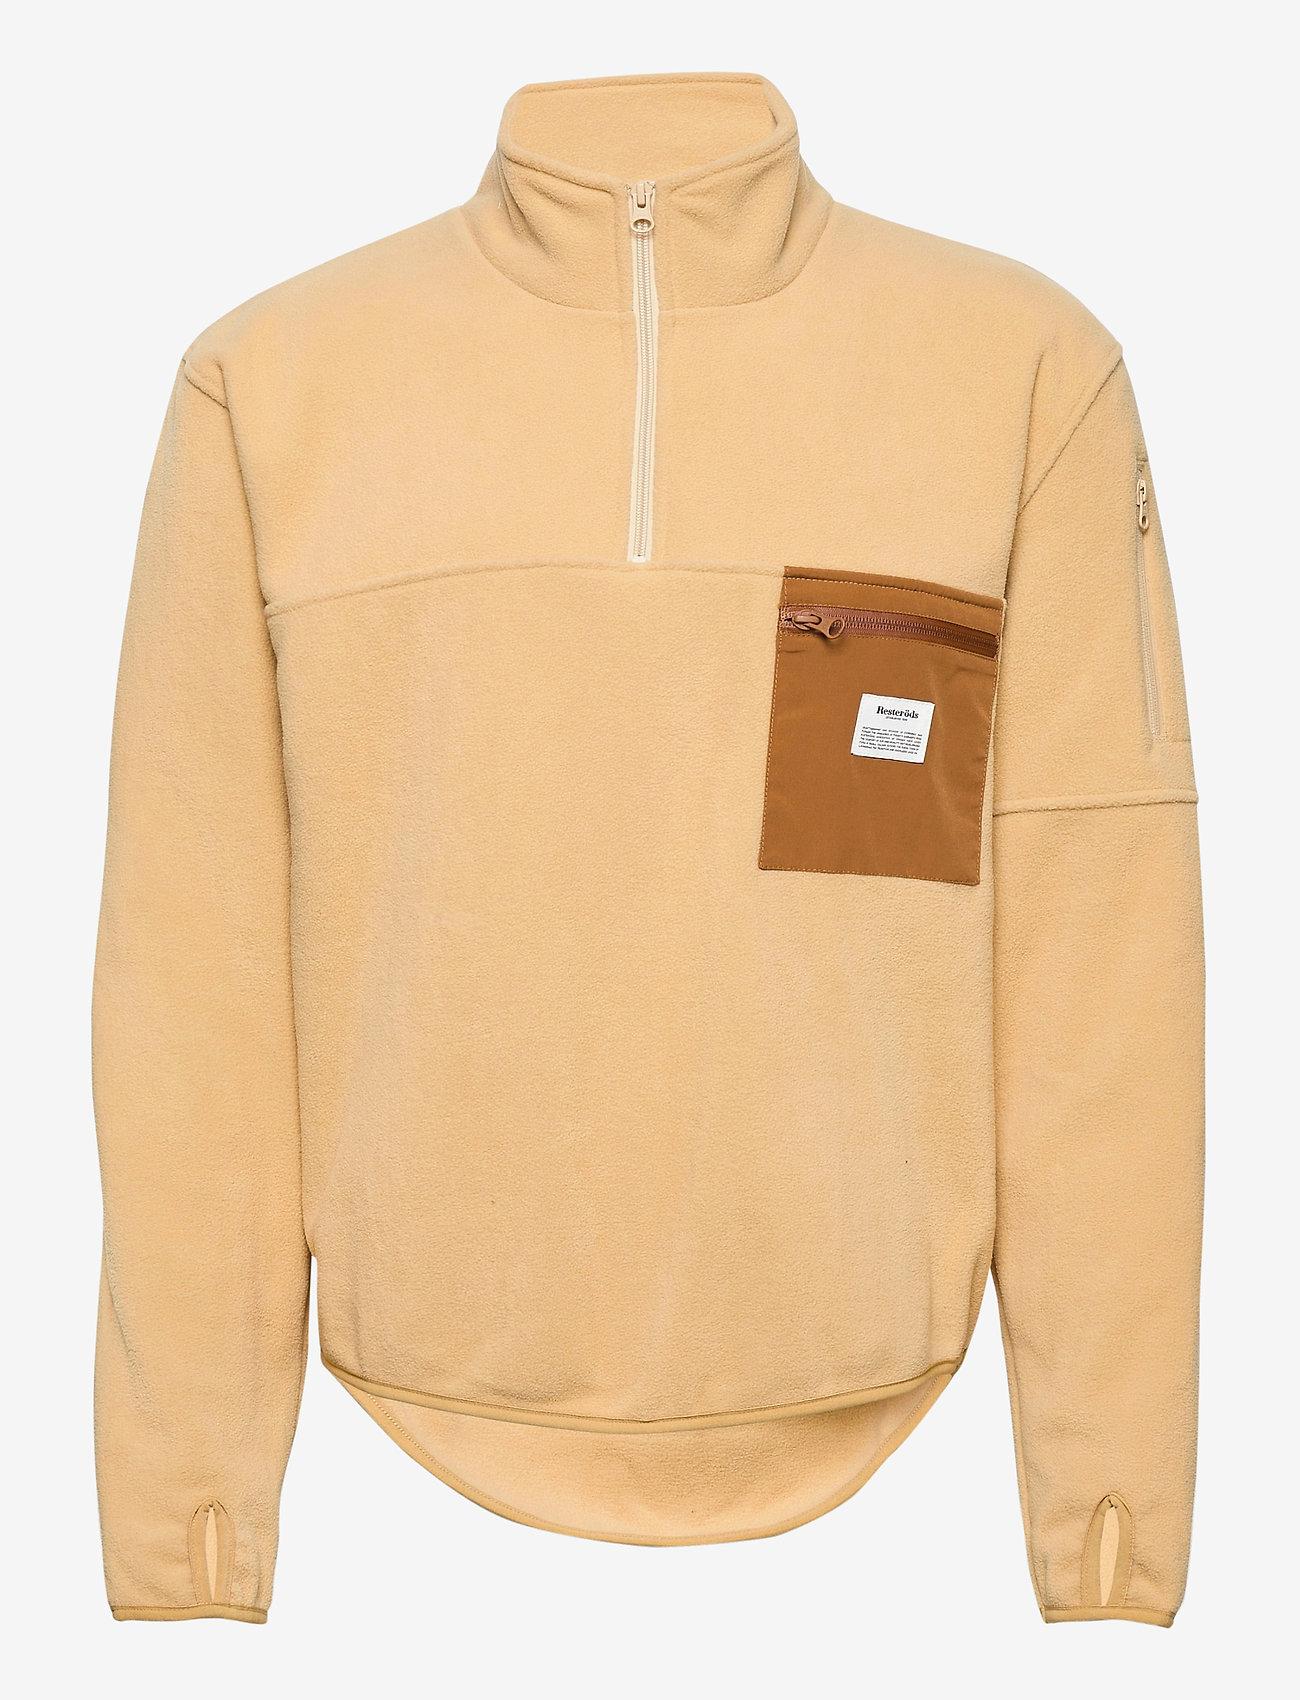 Resteröds - PULLOVER RECYCLED POLYESTER - basic-sweatshirts - brun - 0